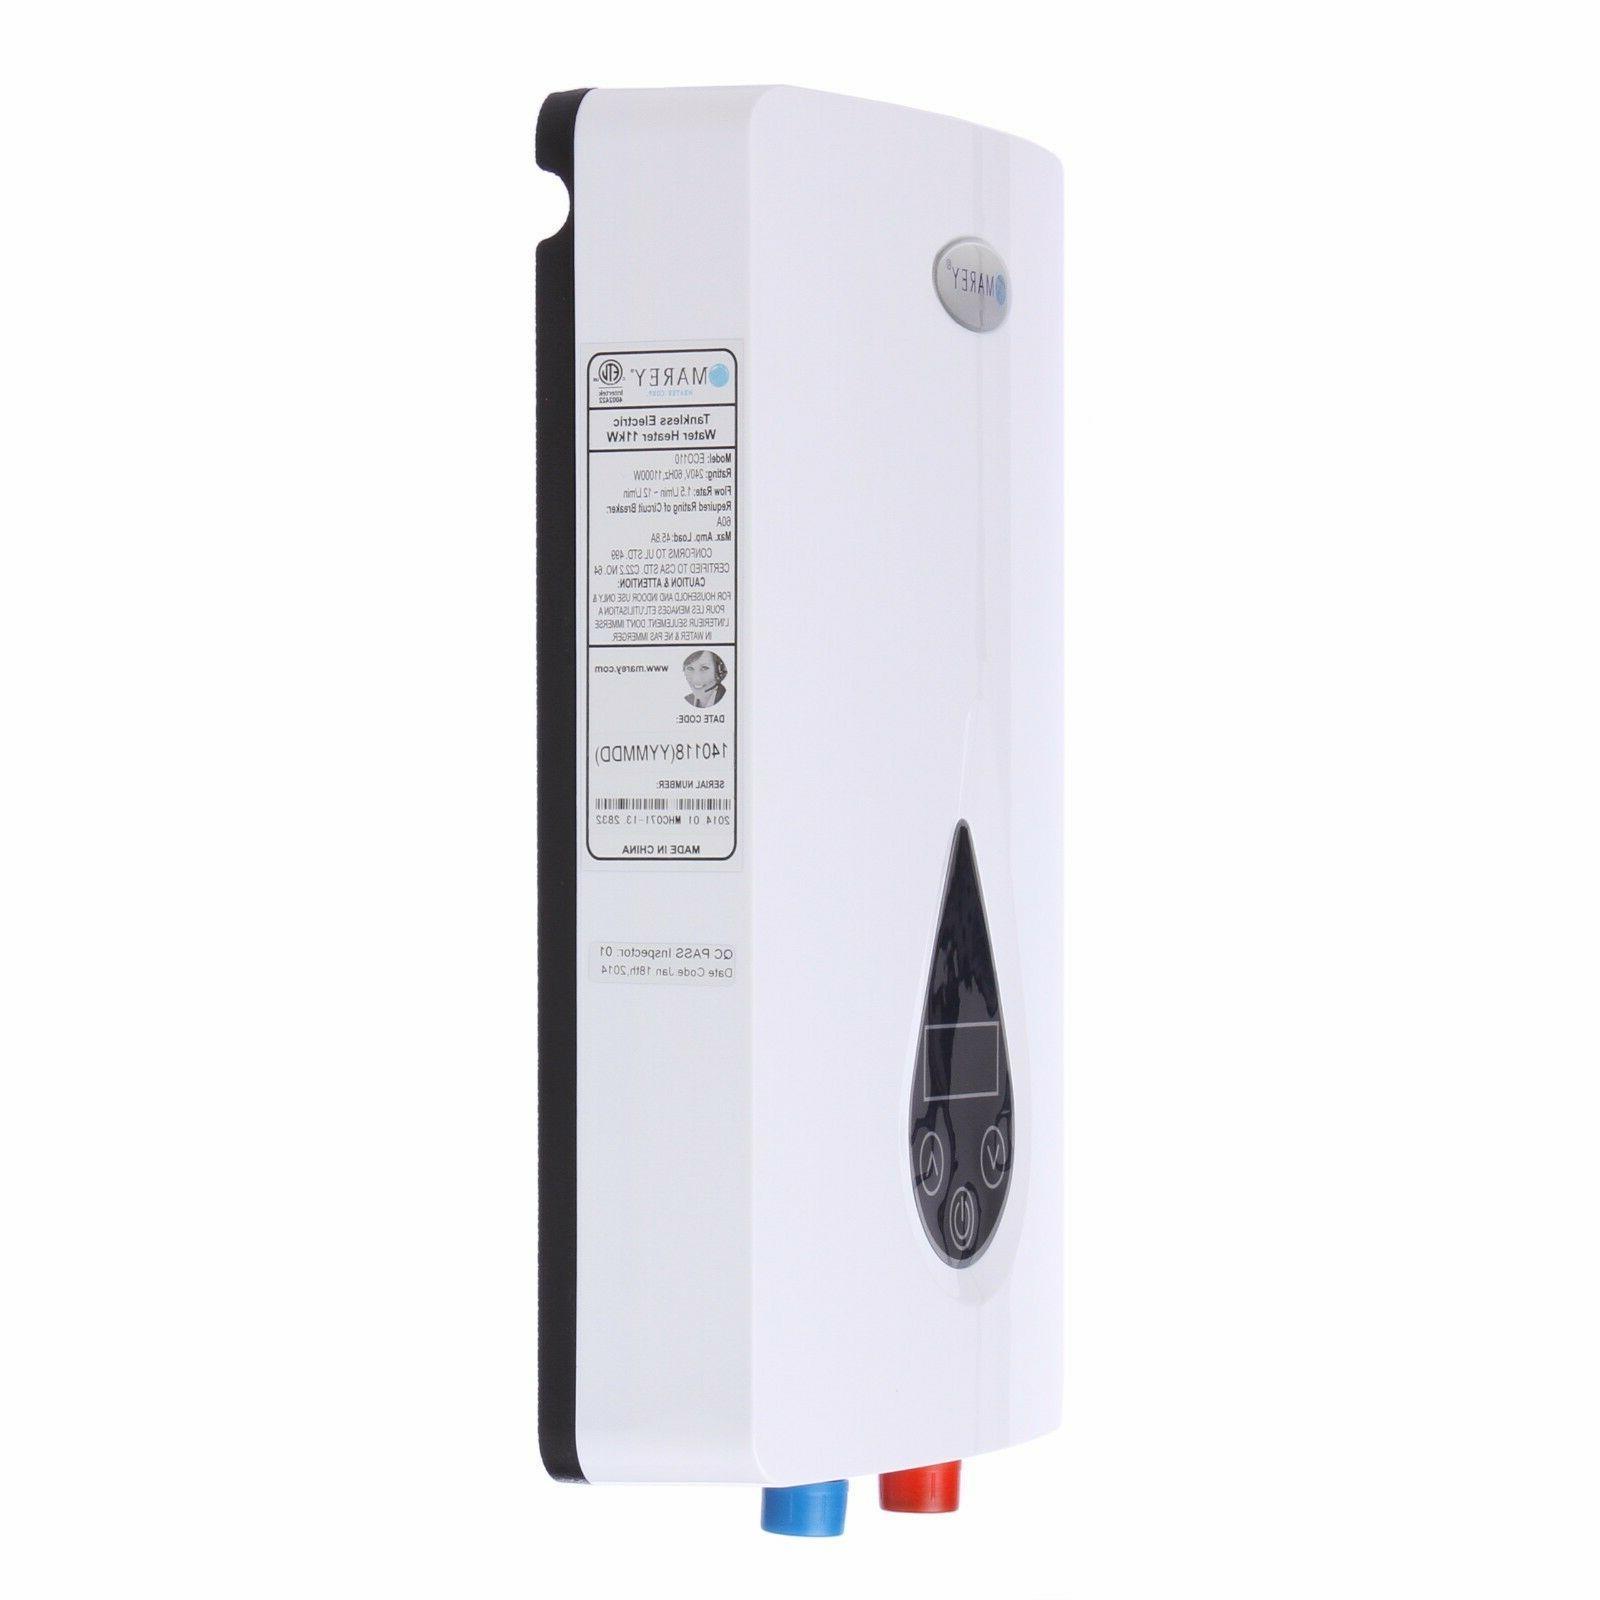 Marey Digital On Heater MAREYECO110